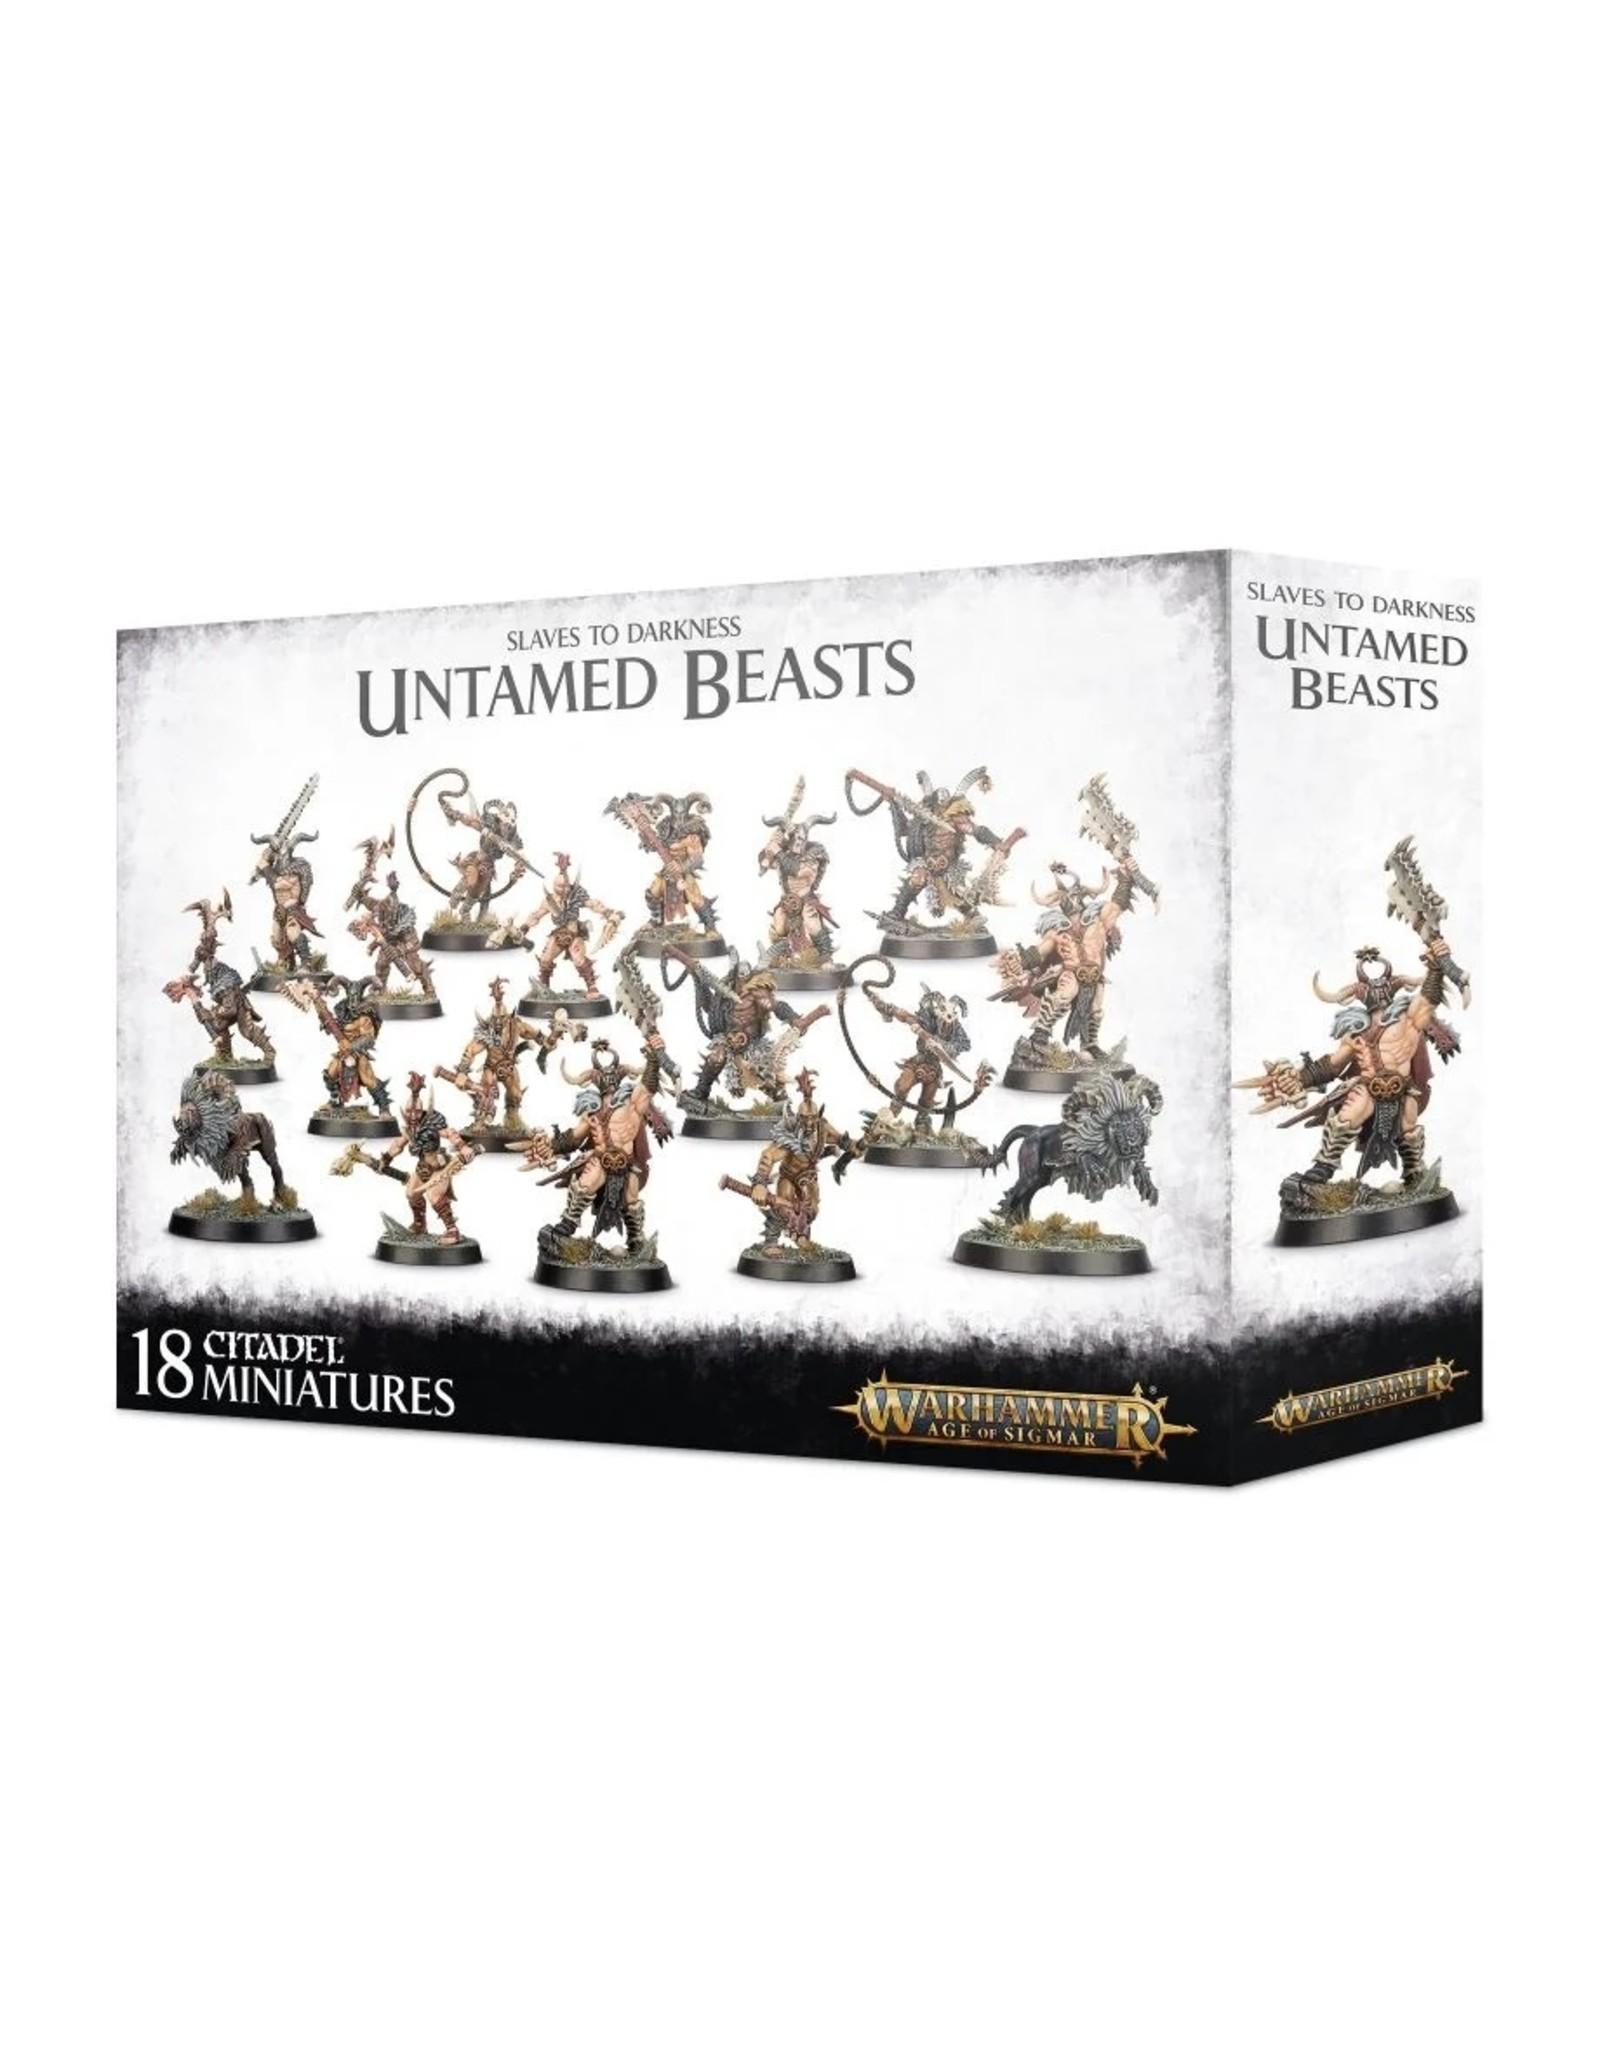 Games Workshop Slaves to Darkness: Untamed Beasts